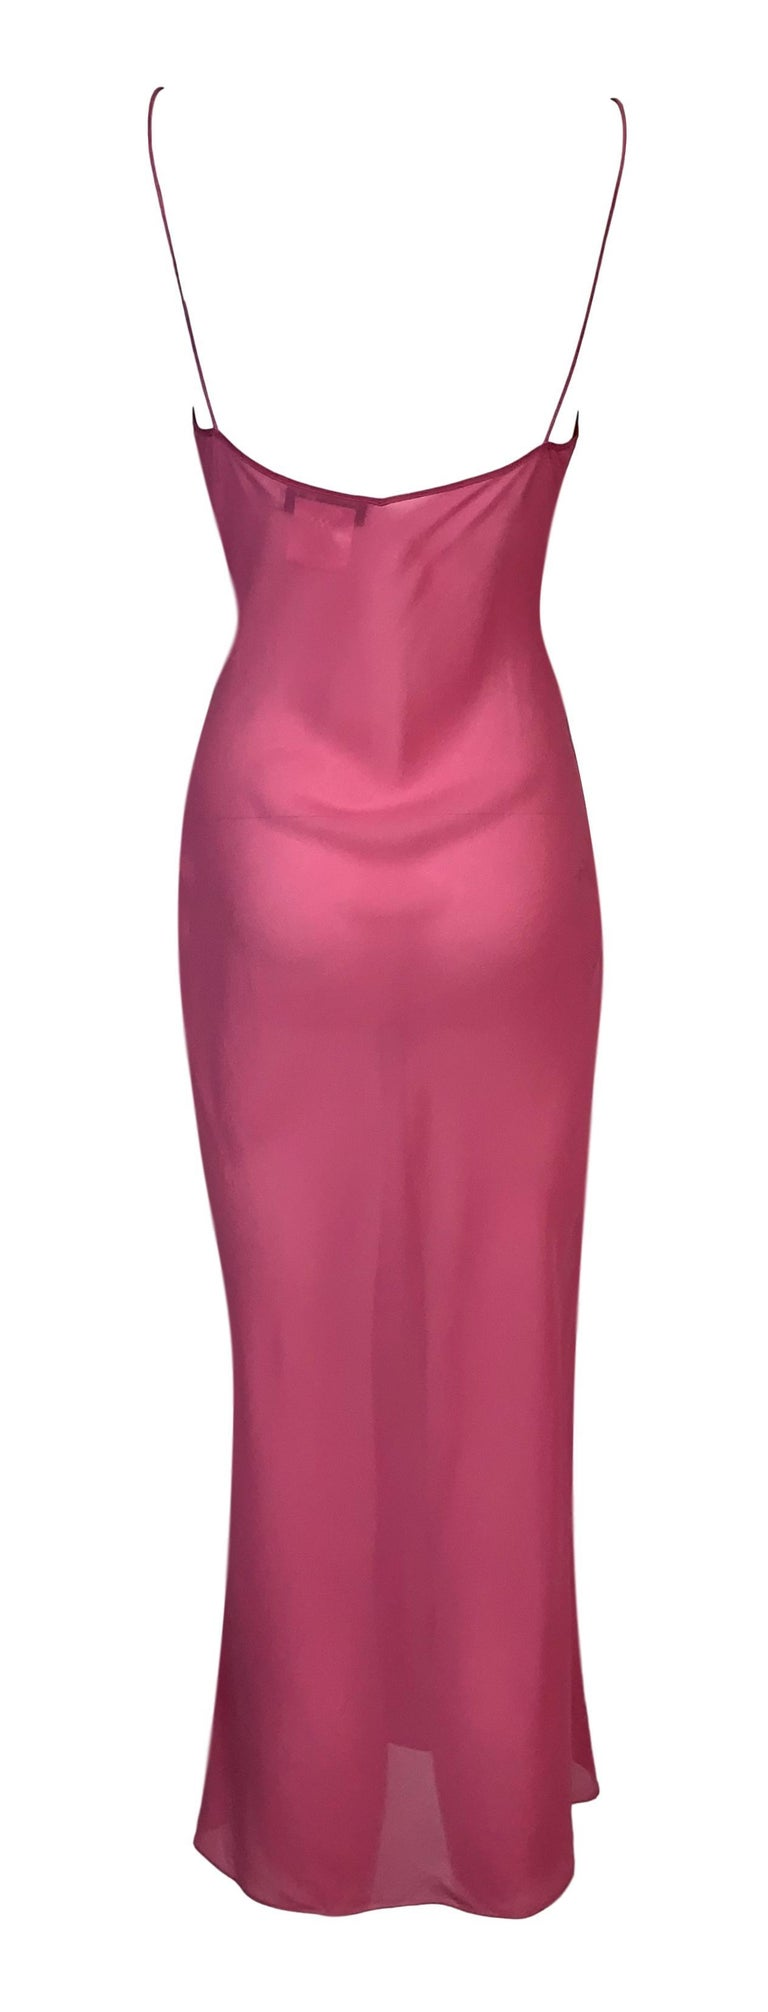 S/S 2002 Christian Dior John Galliano Runway Sheer Pink Hooded 2 Dresses 3